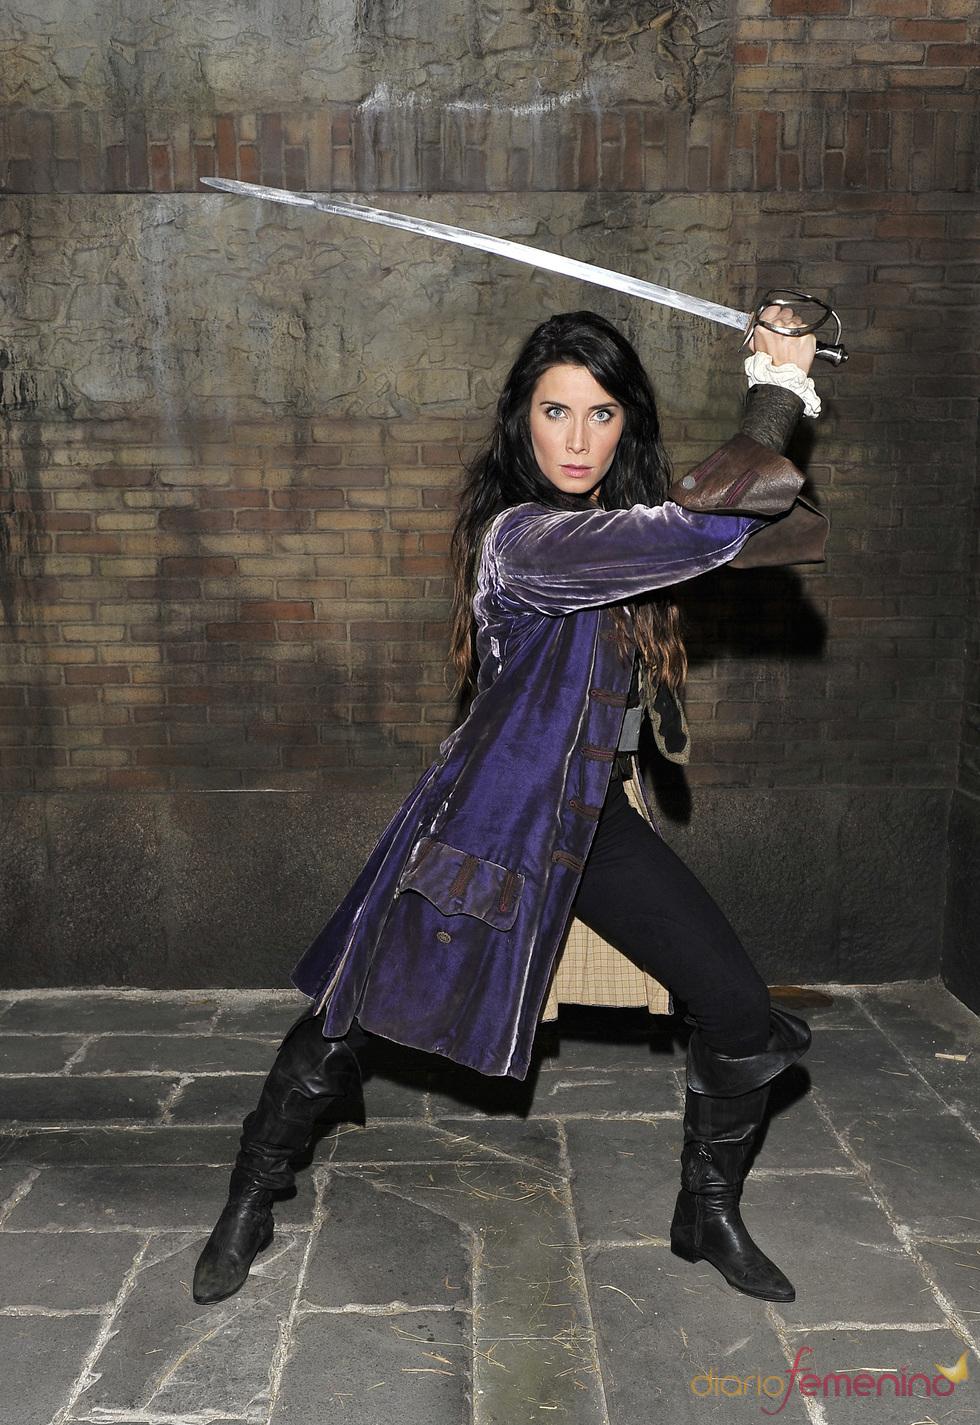 Pilar Rubio interpreta a Carmen Bocanegra en 'Piratas'